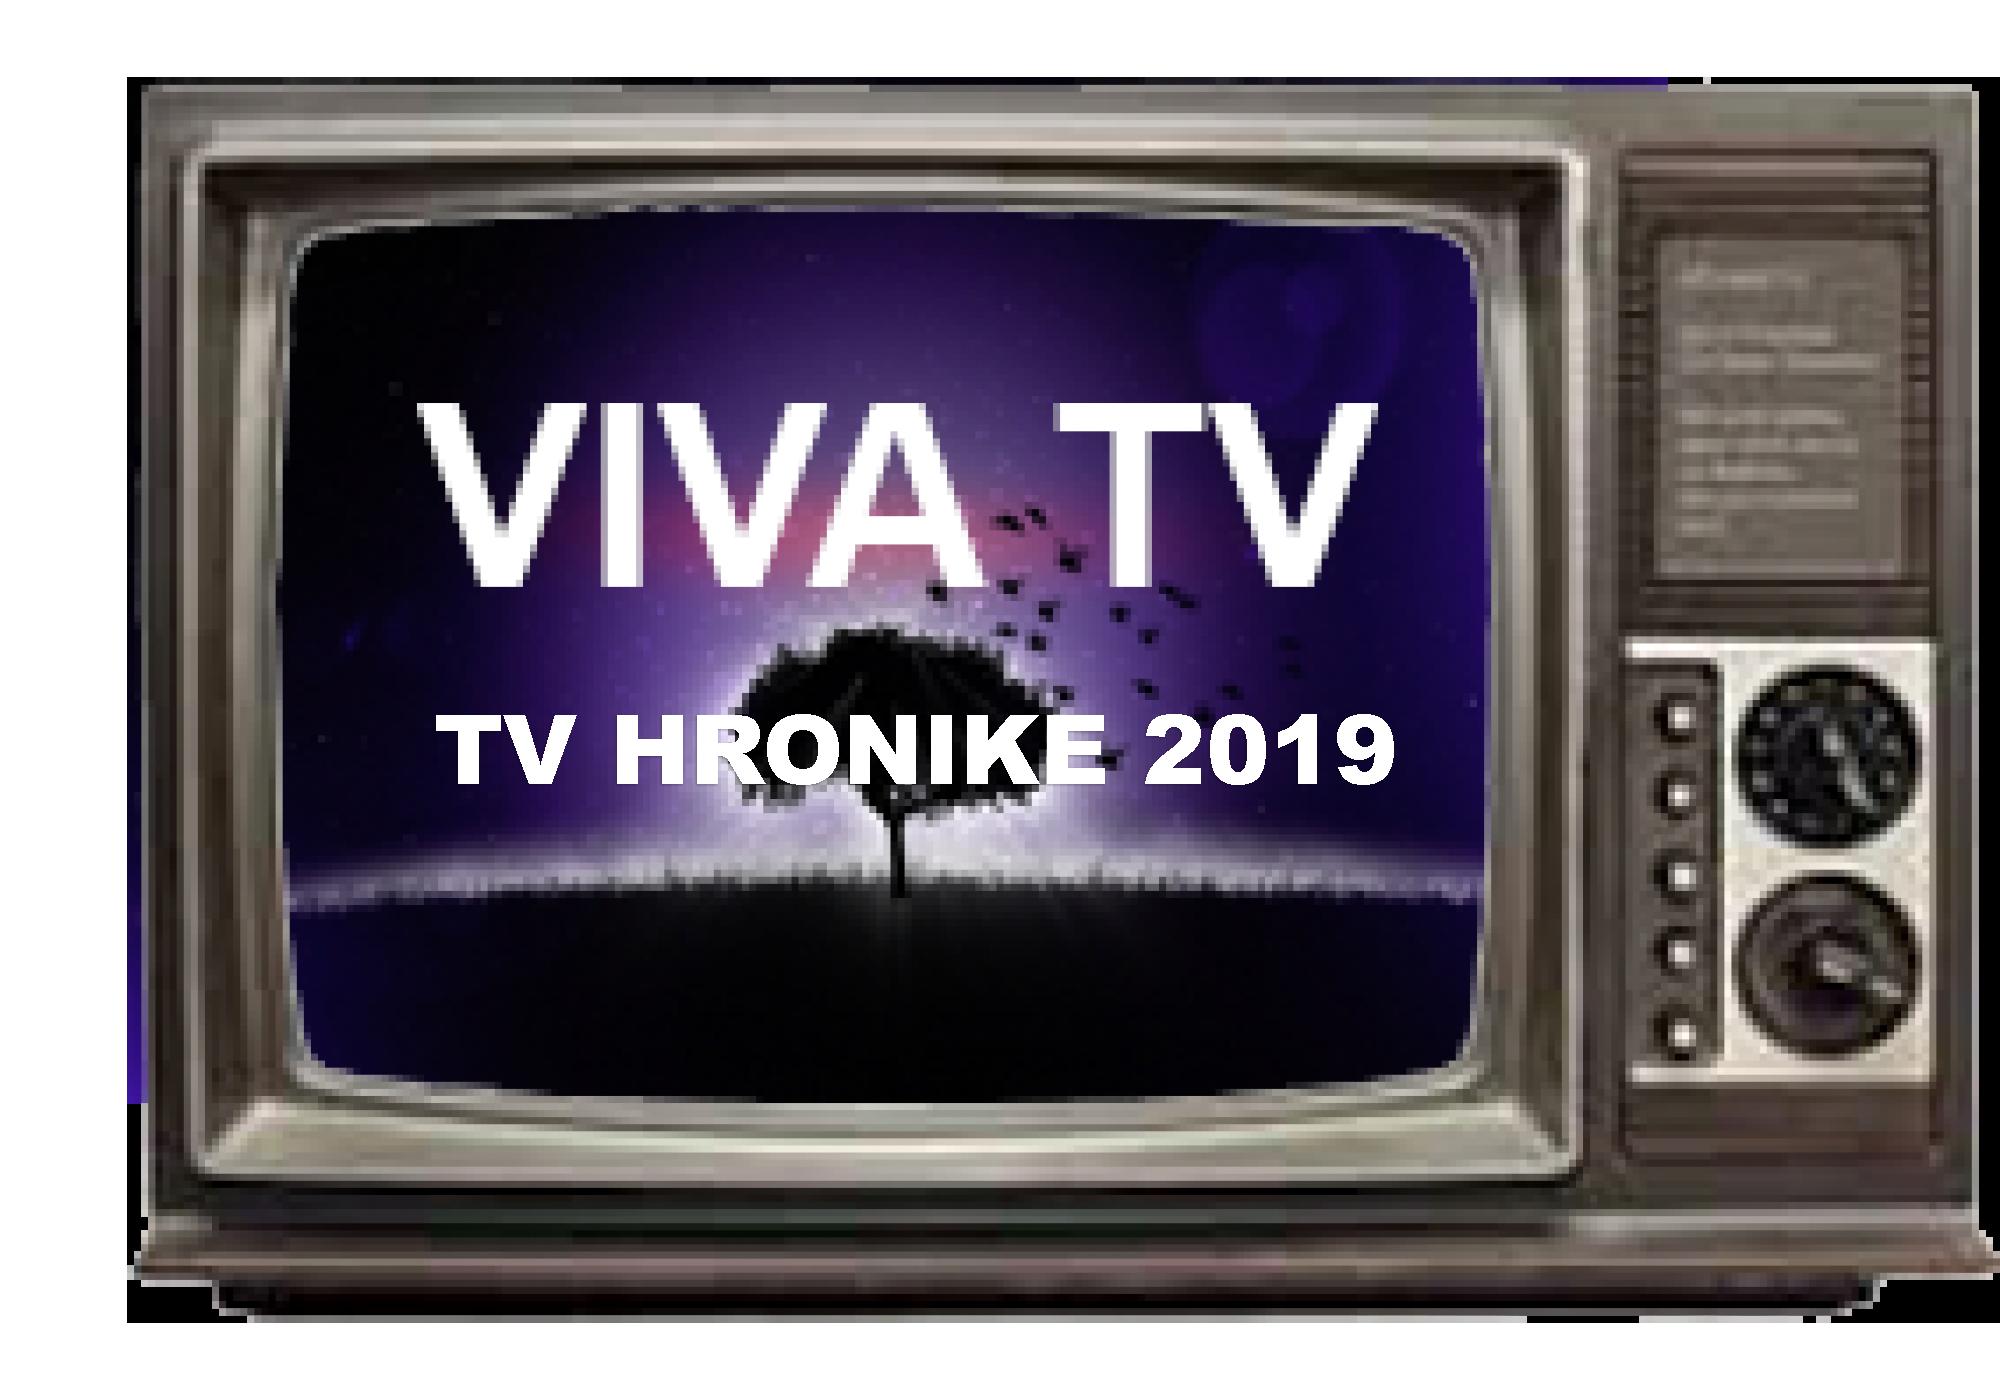 HRONIKE 2019